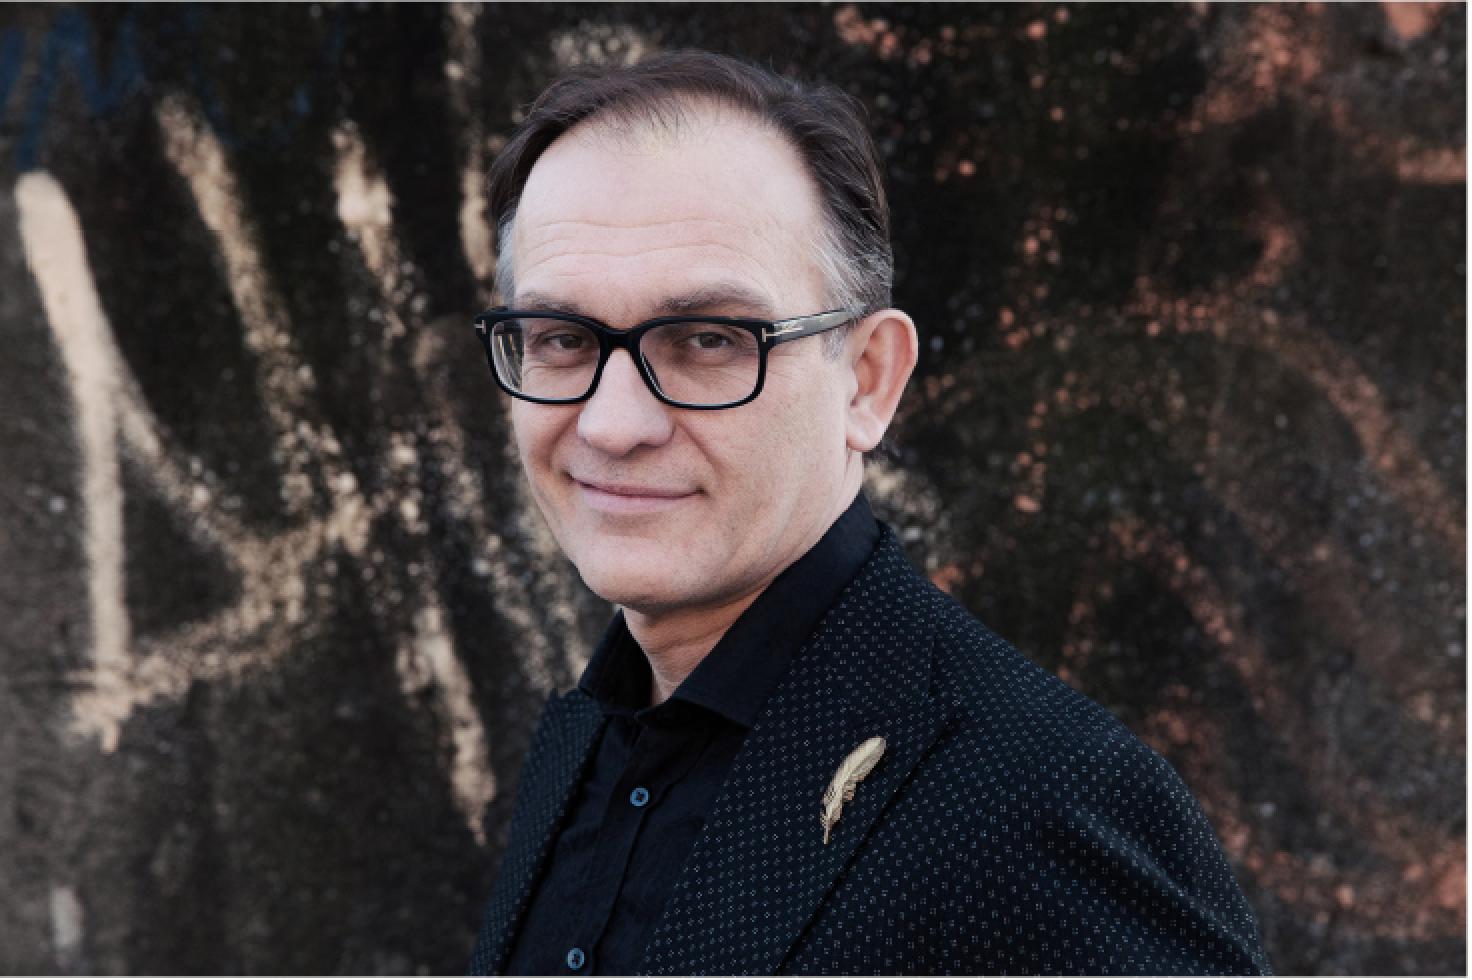 Sverre Indris Joner